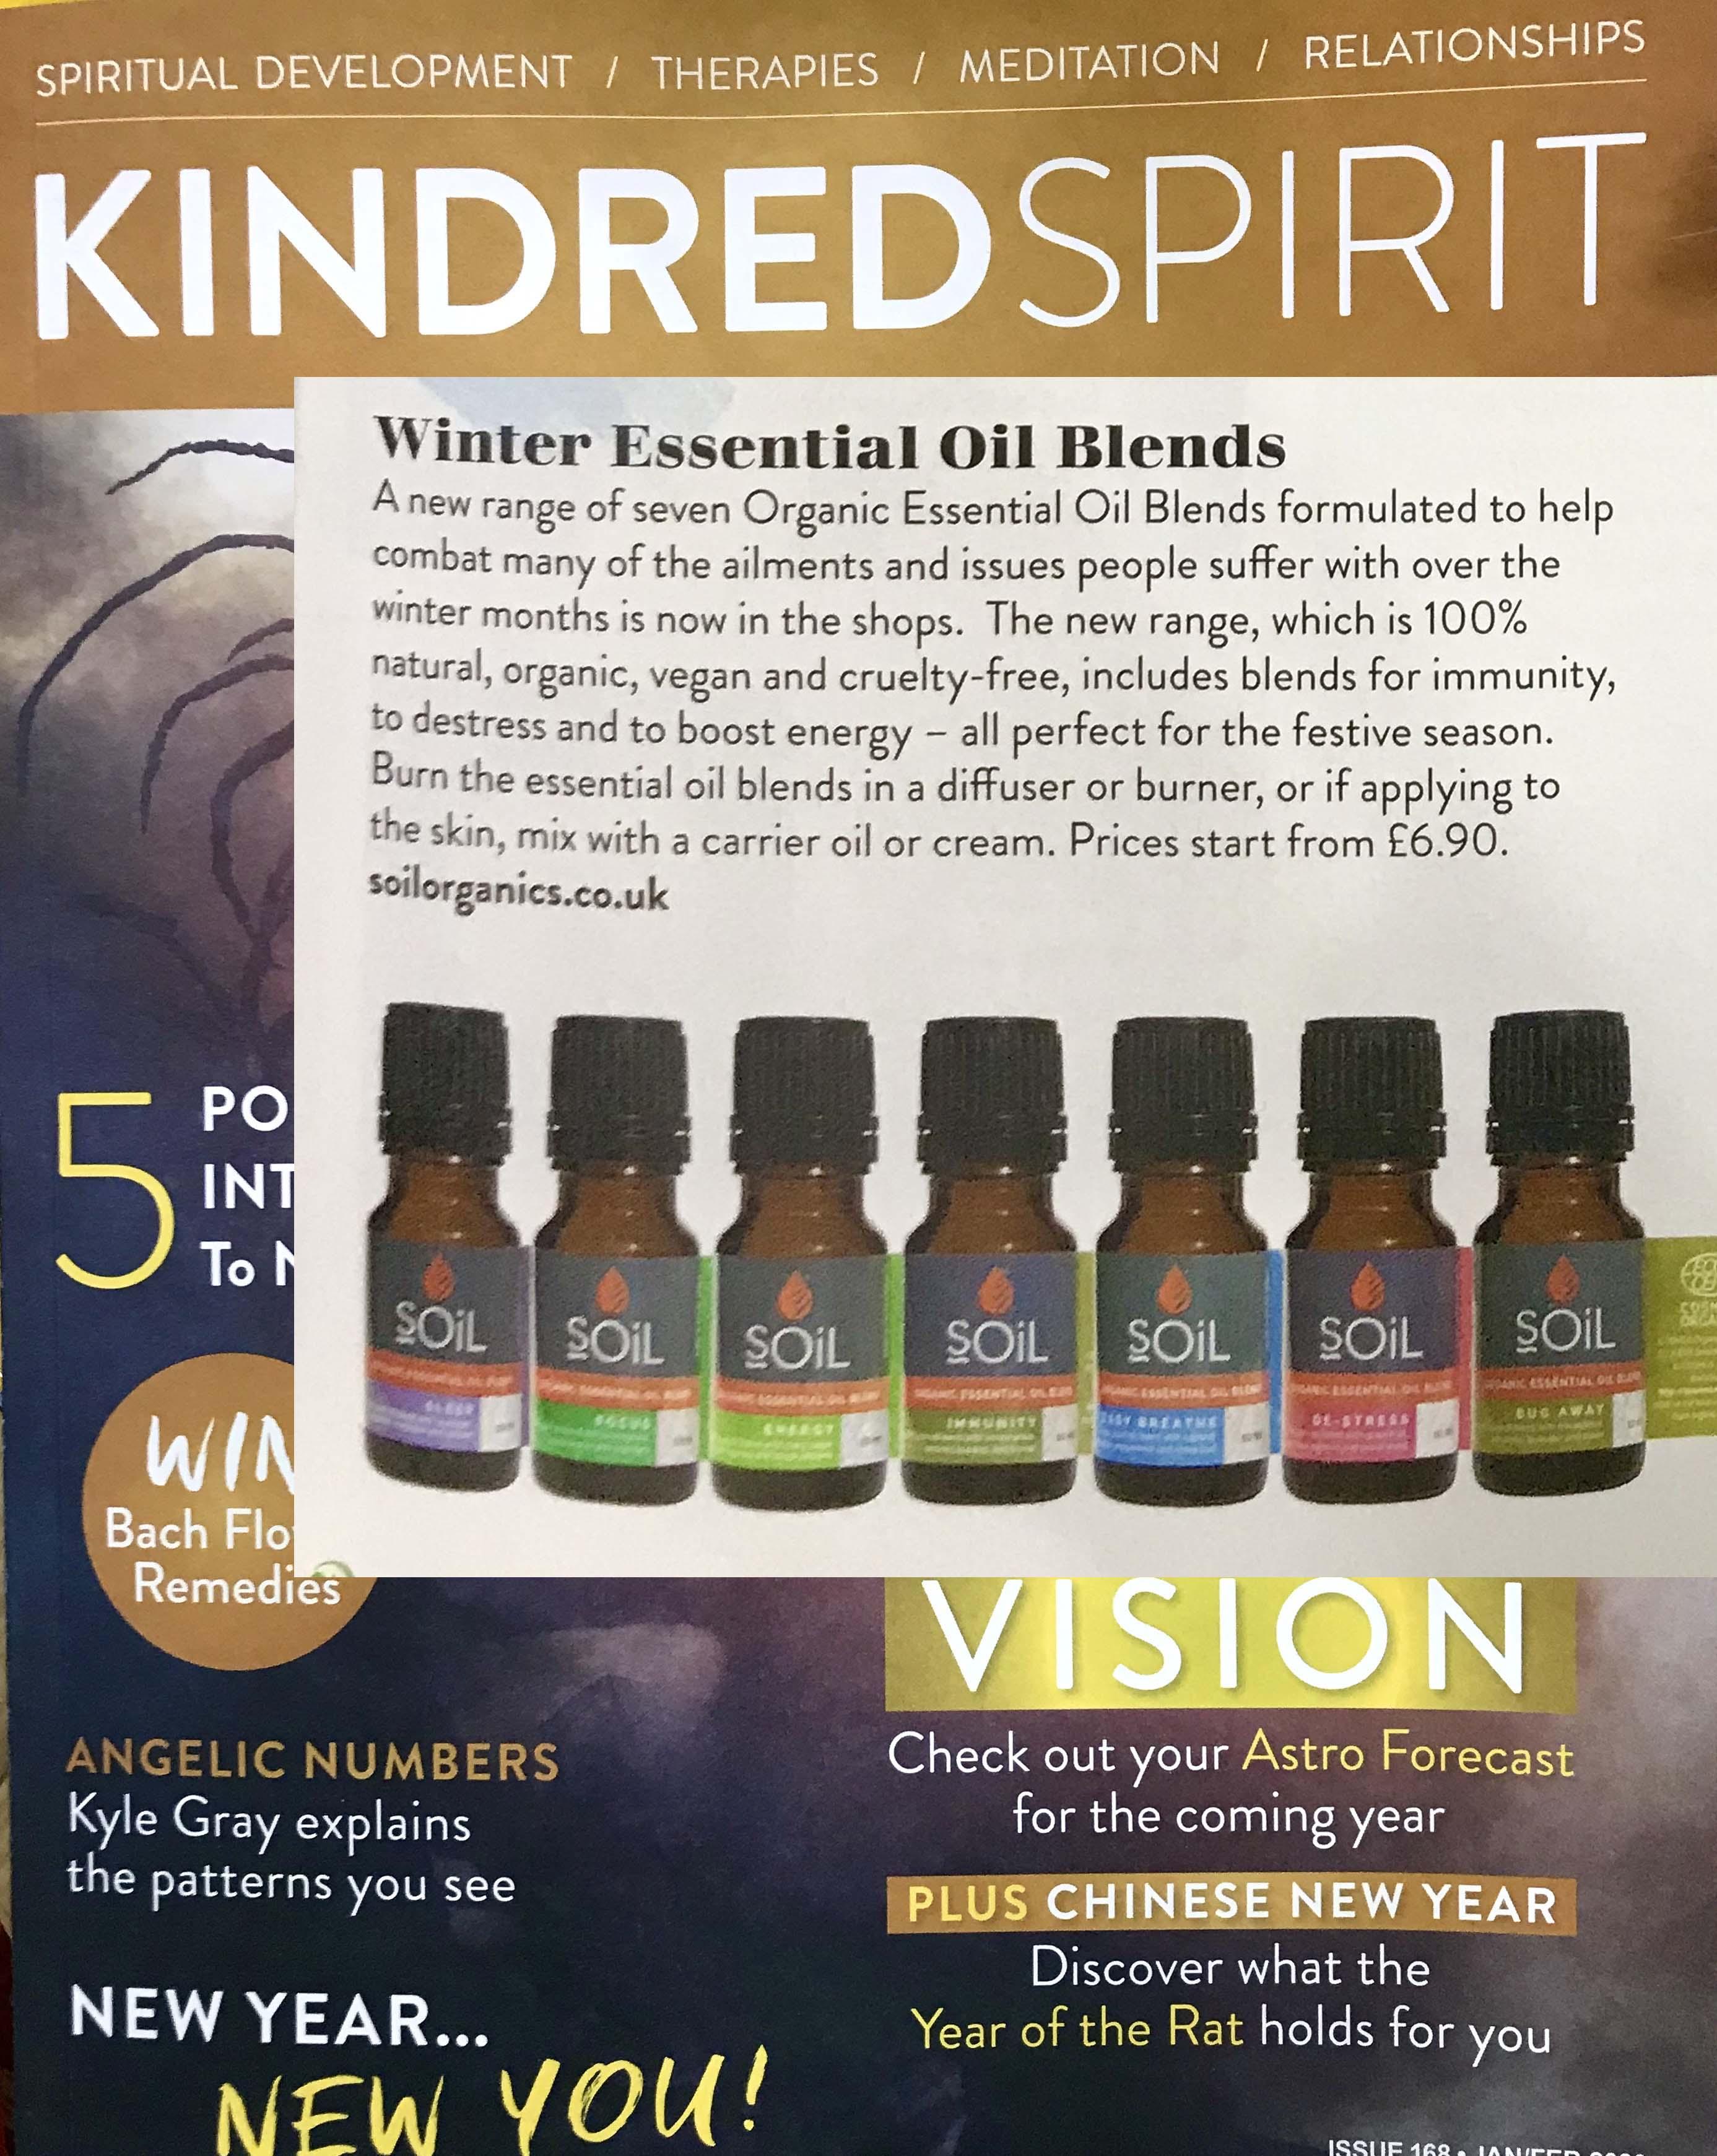 SOiL aromatherapy in Kindred Spirit